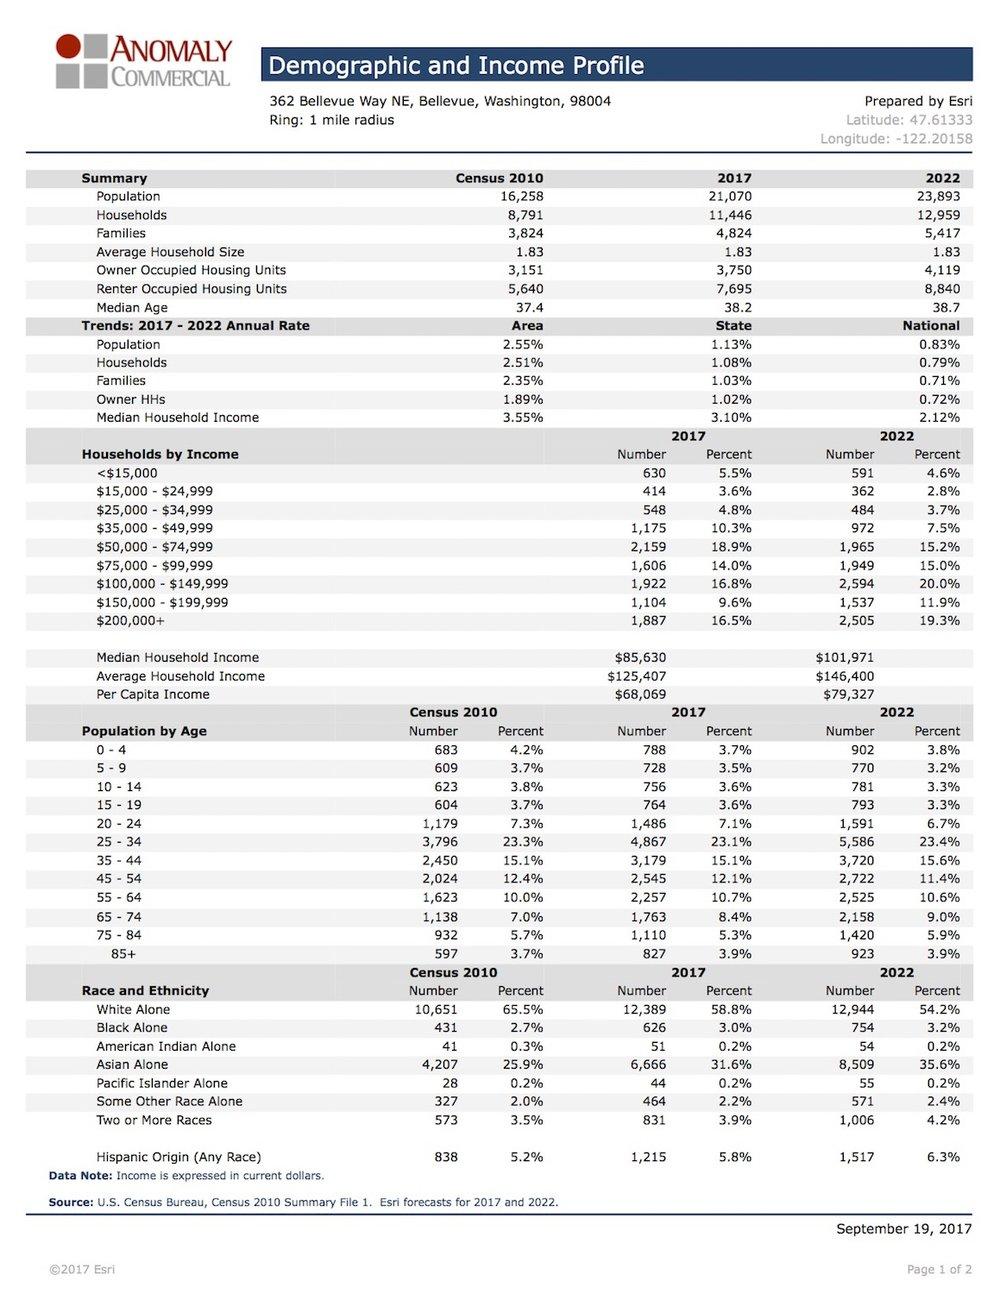 Demographic & Income Profile - Avalon Meydenbaur.jpg